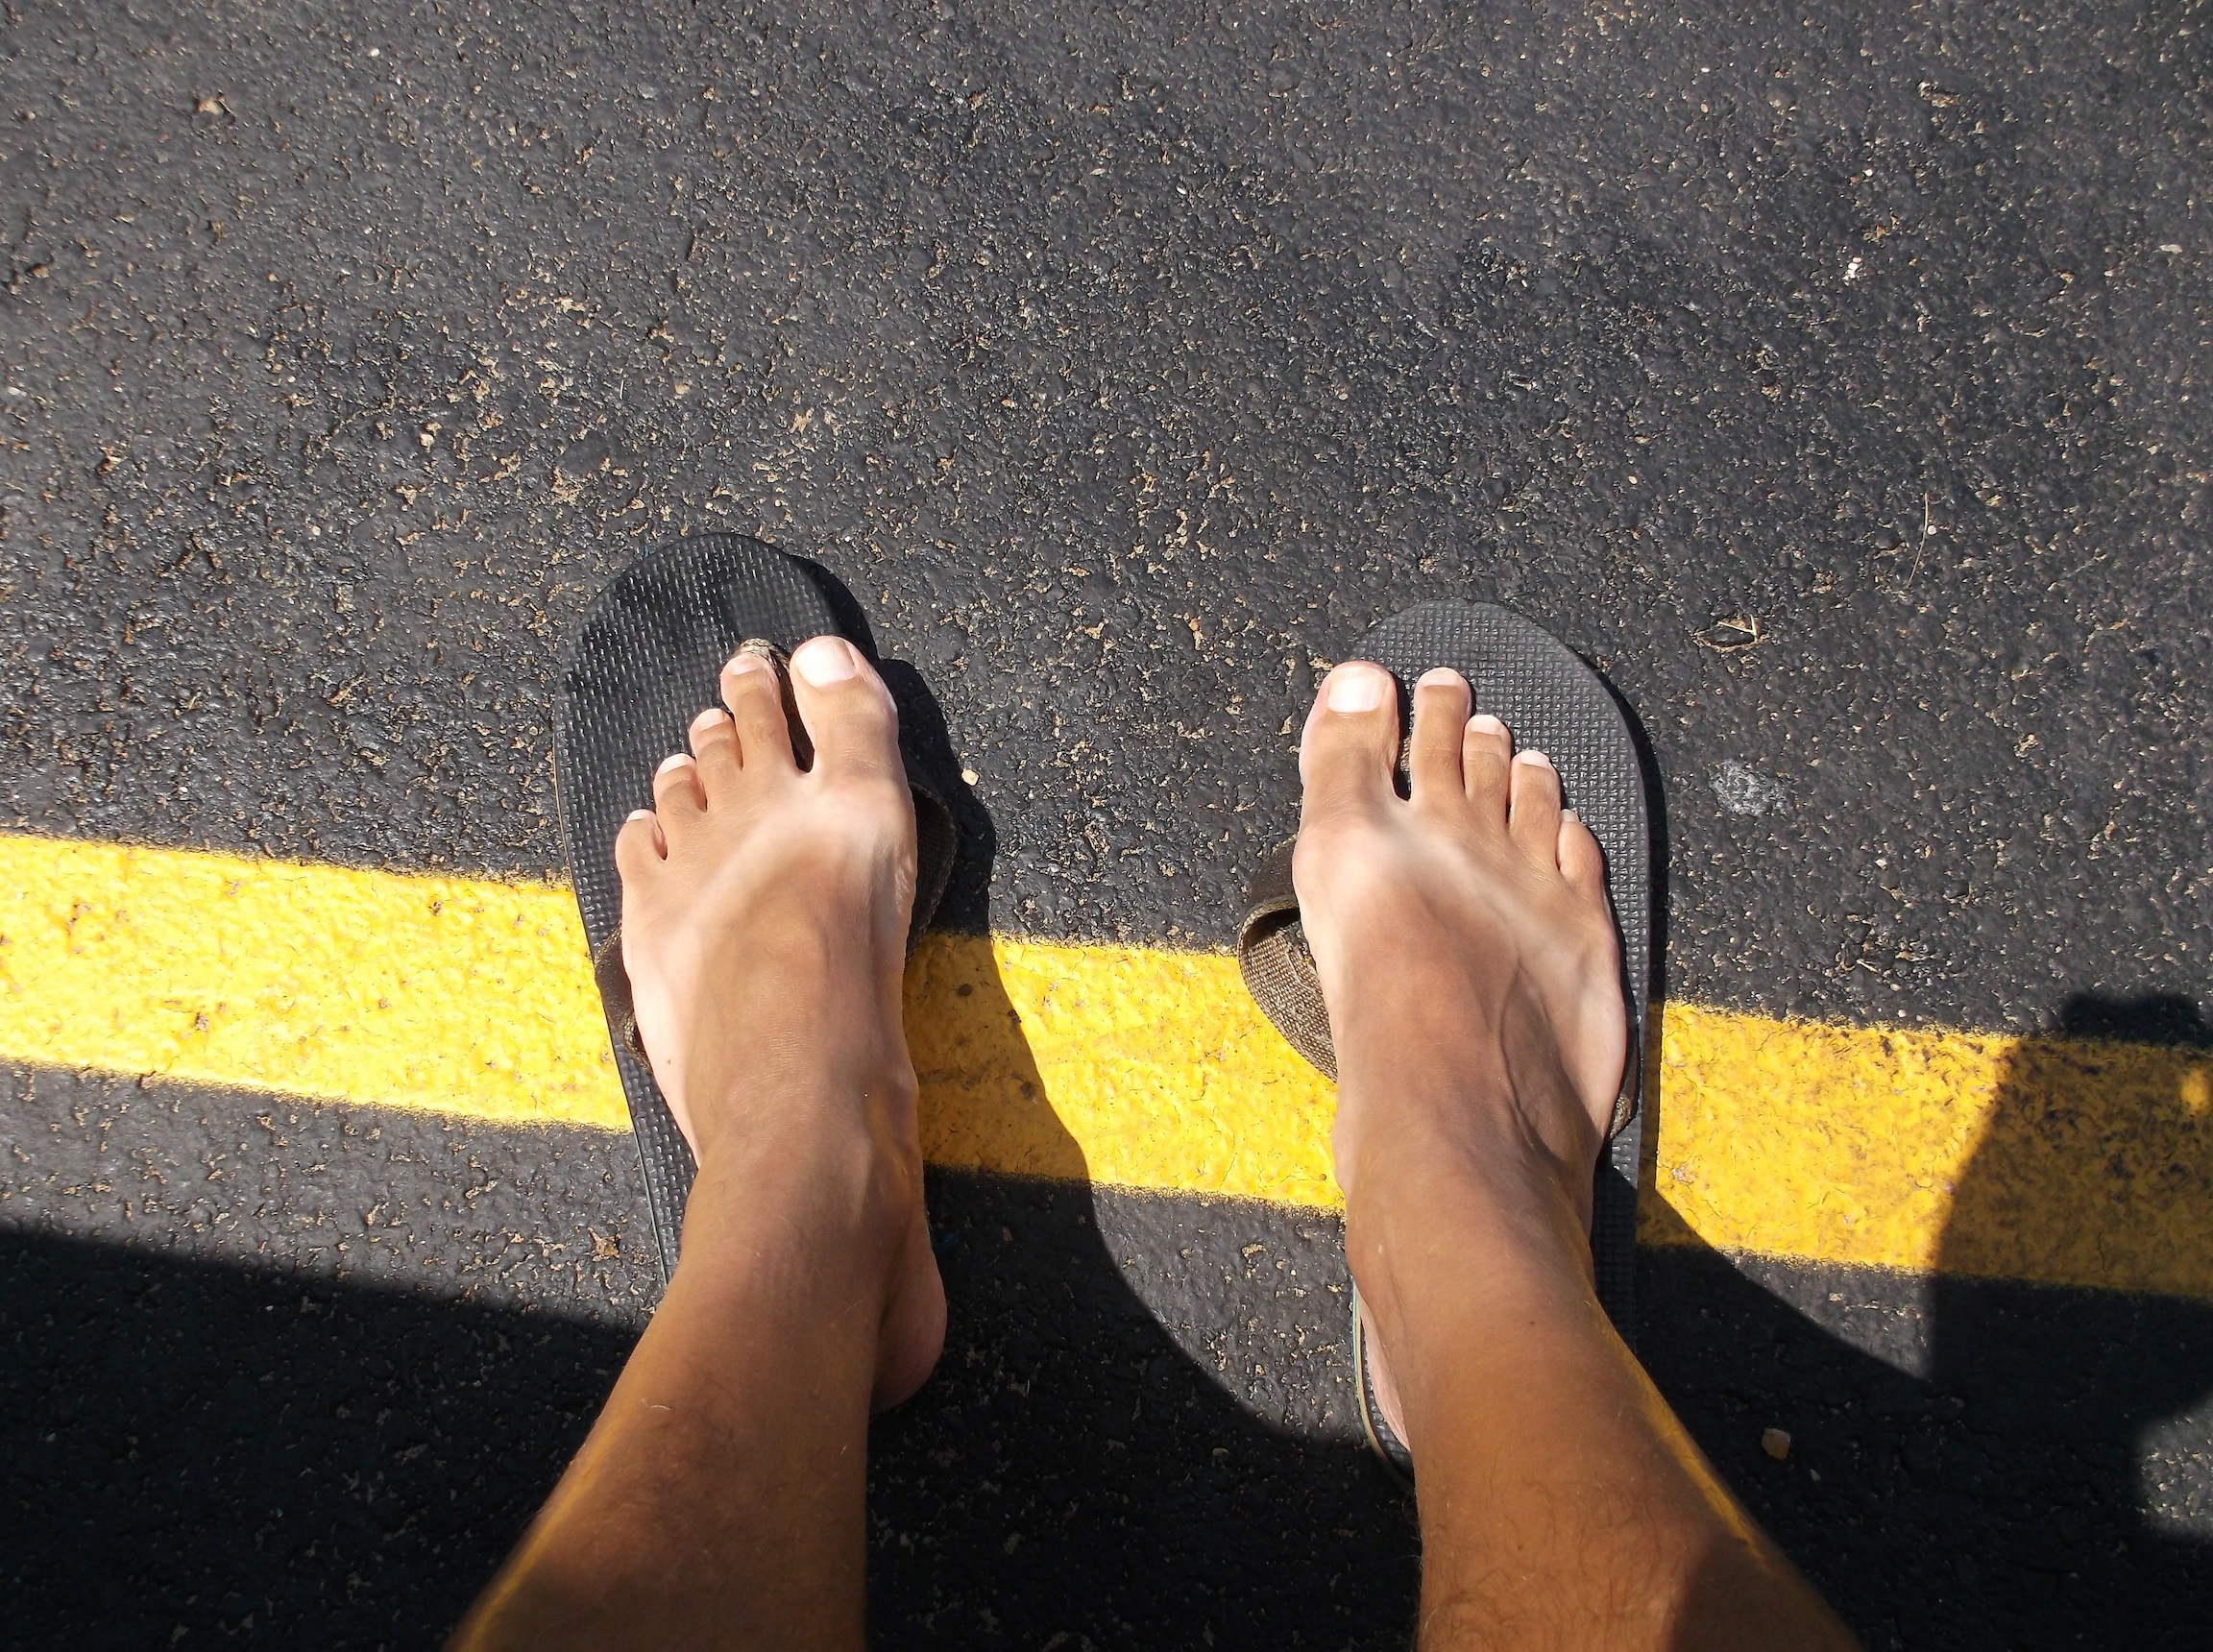 flip flop tan lines  4a20c373558d